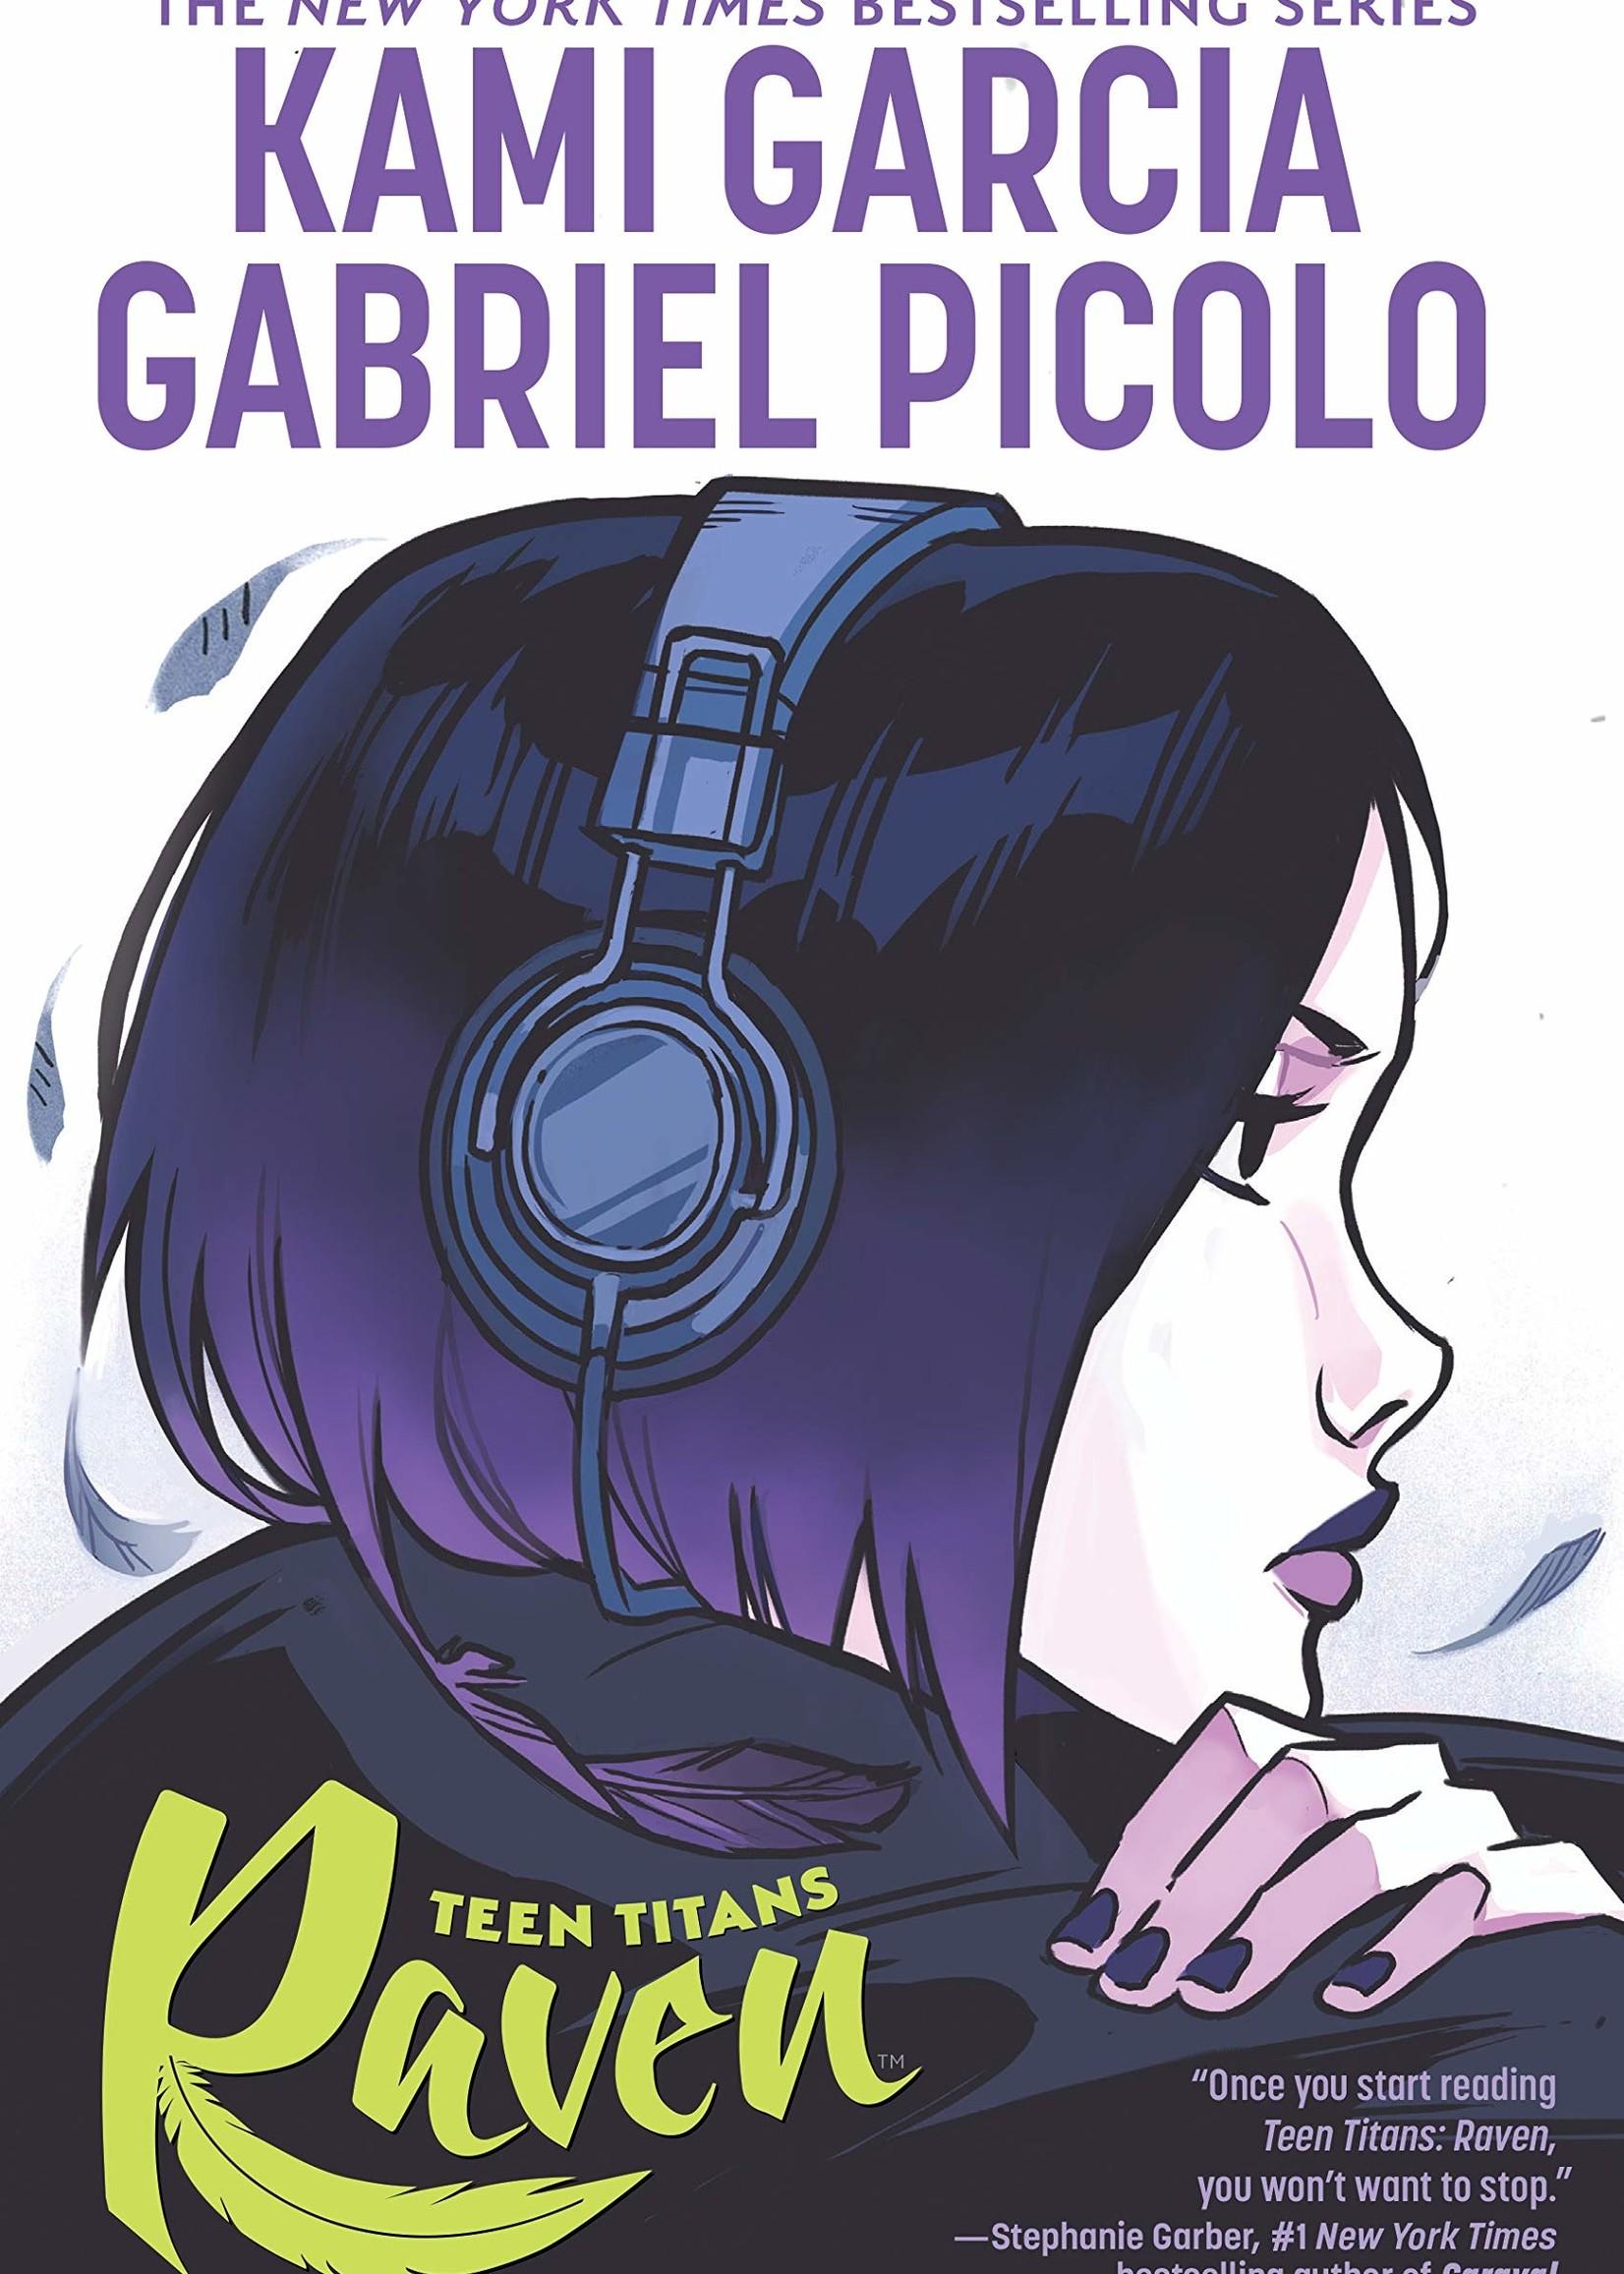 Teen Titans: Raven Graphic Novel - Paperback